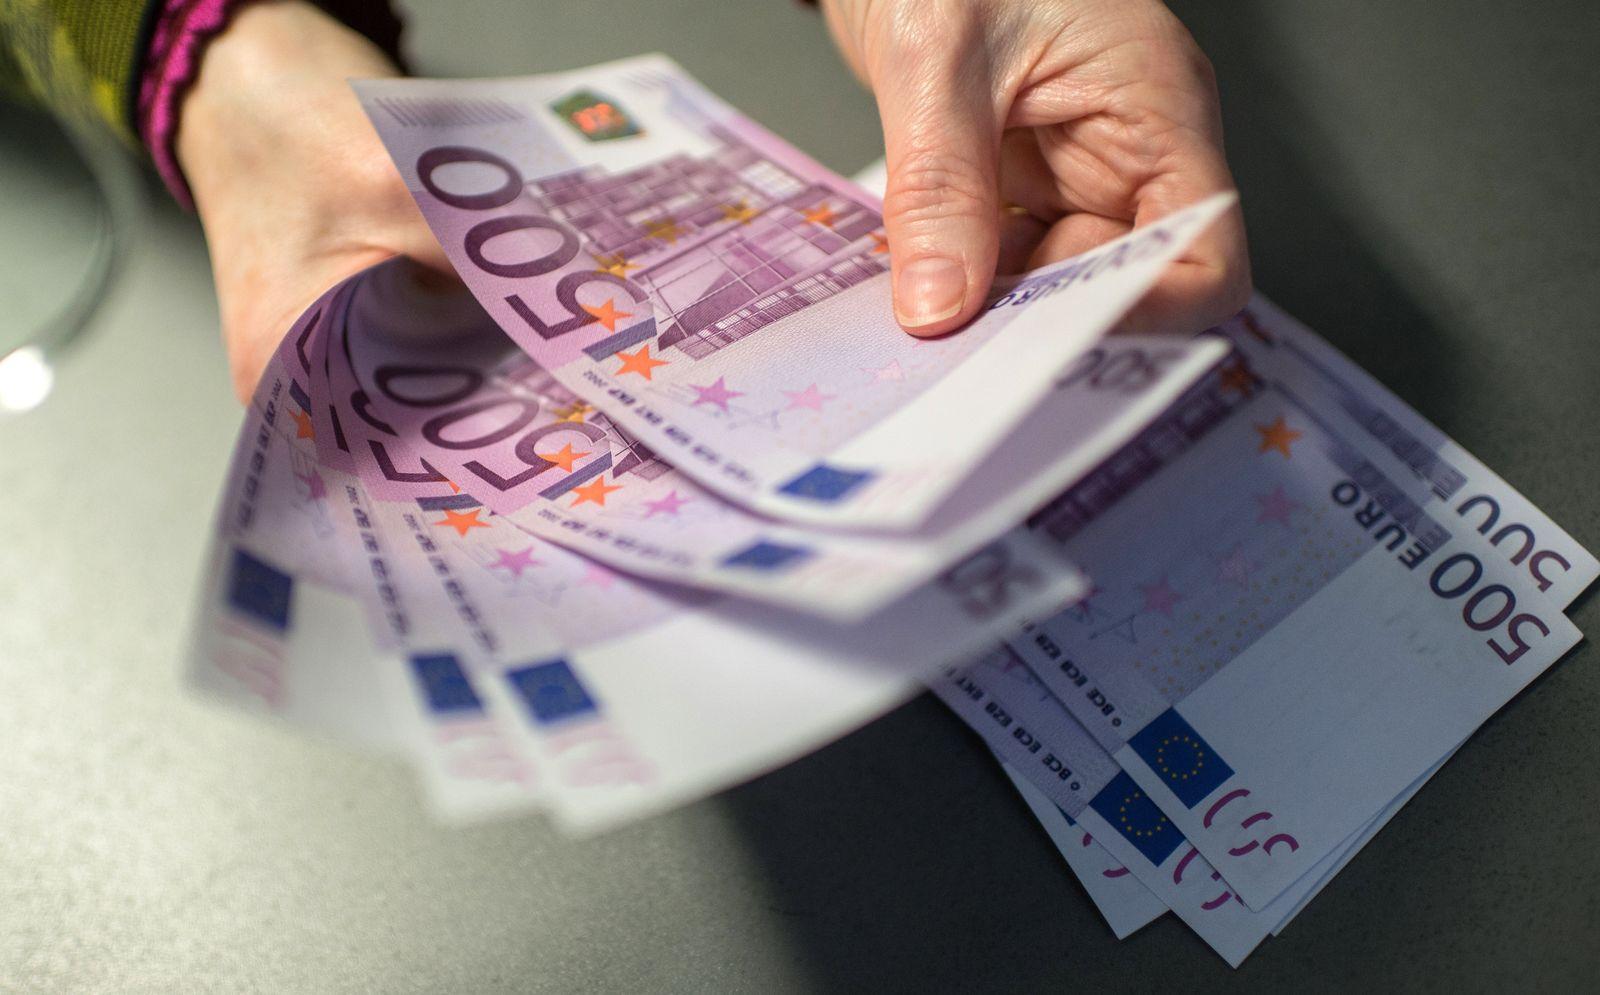 Bargeld / 500 Euro